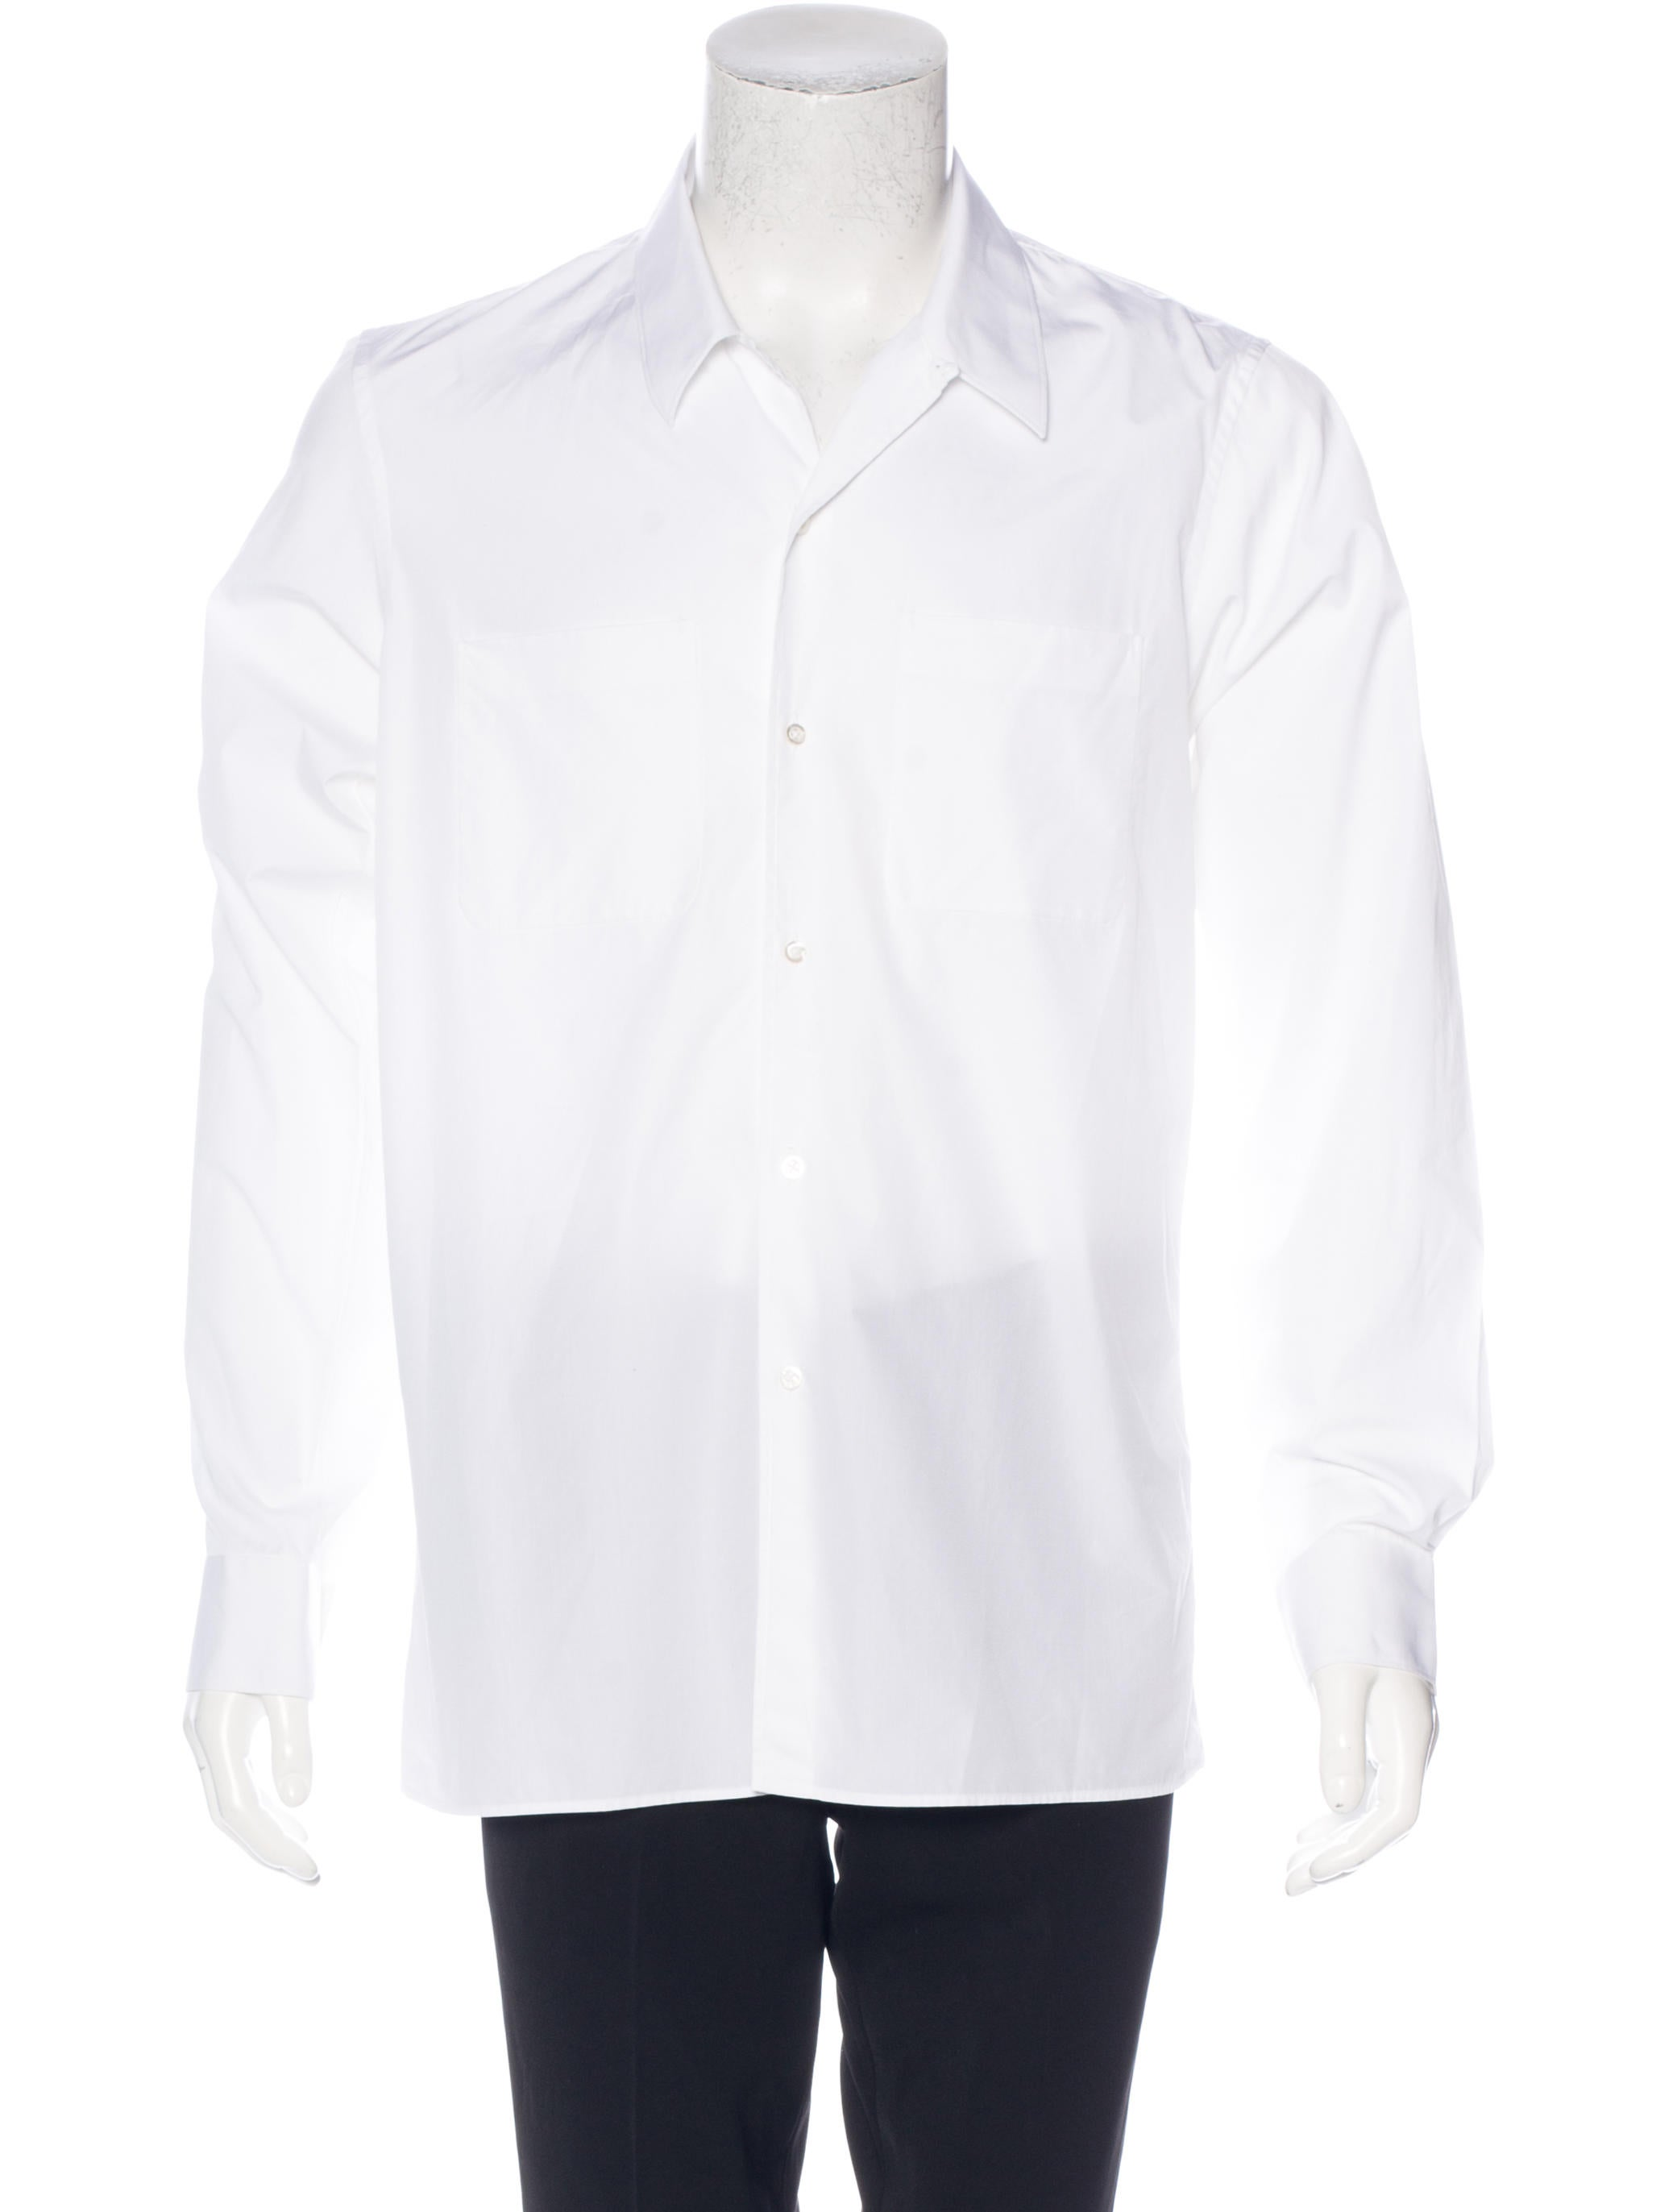 Jil sander woven button up shirt clothing jil37176 for Jil sander mens shirt